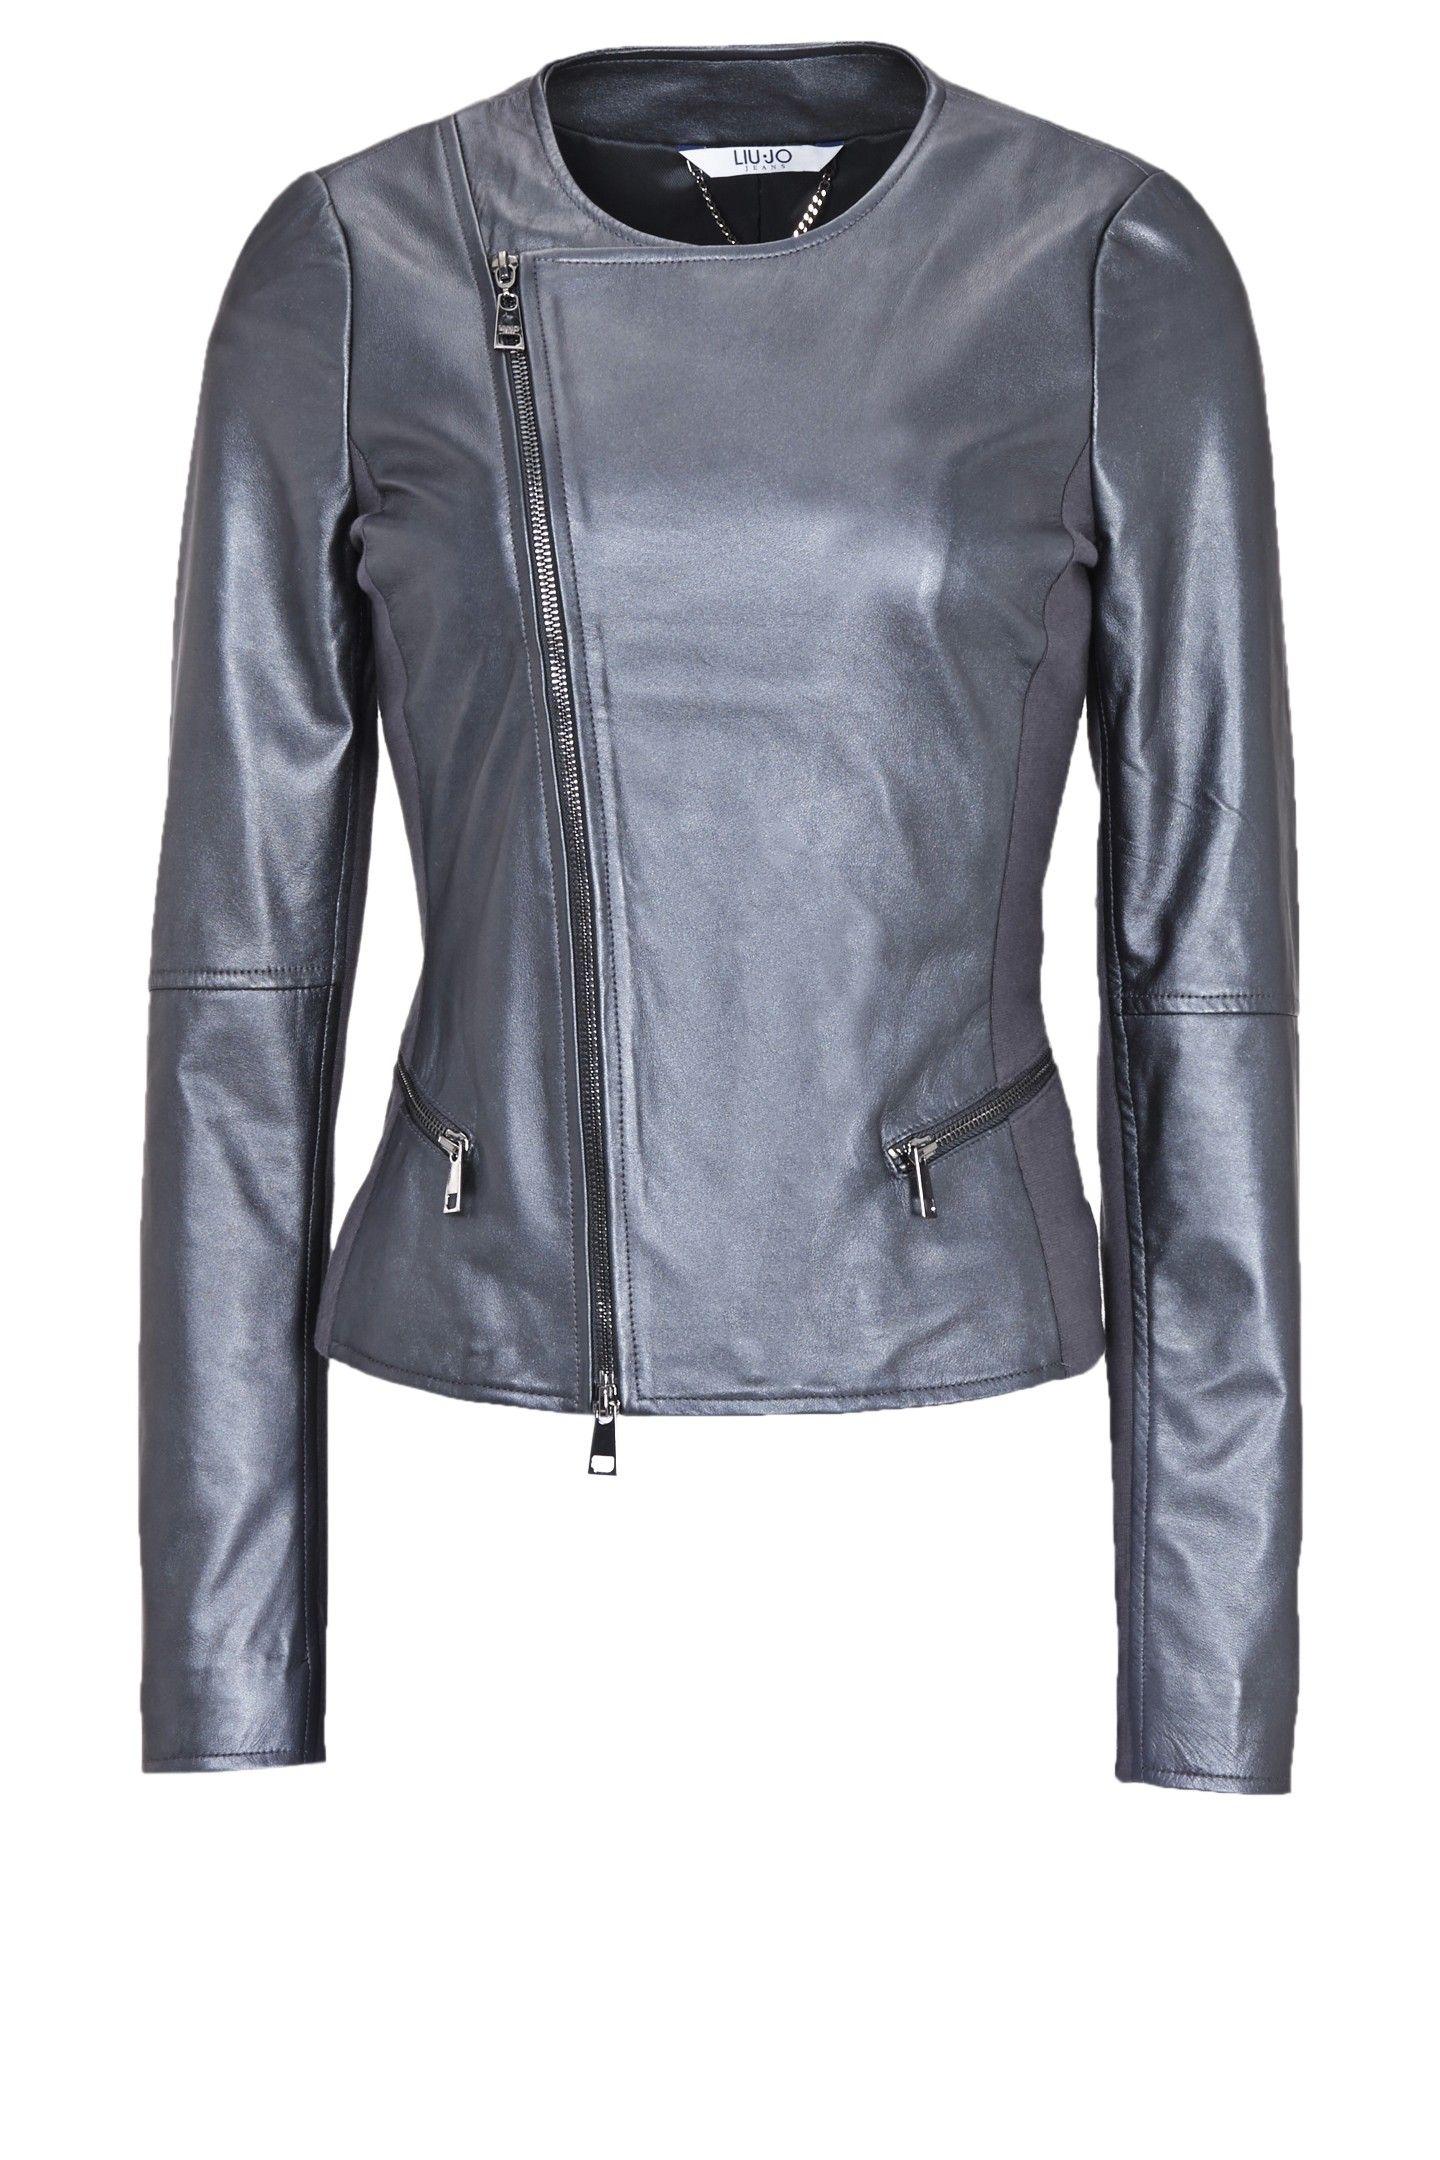 La giacca di pelle corta e sciancrata abbinabile a pantaloni e abitini - Short and fitted Leather jacket matching pants and dresses #VirgoImage